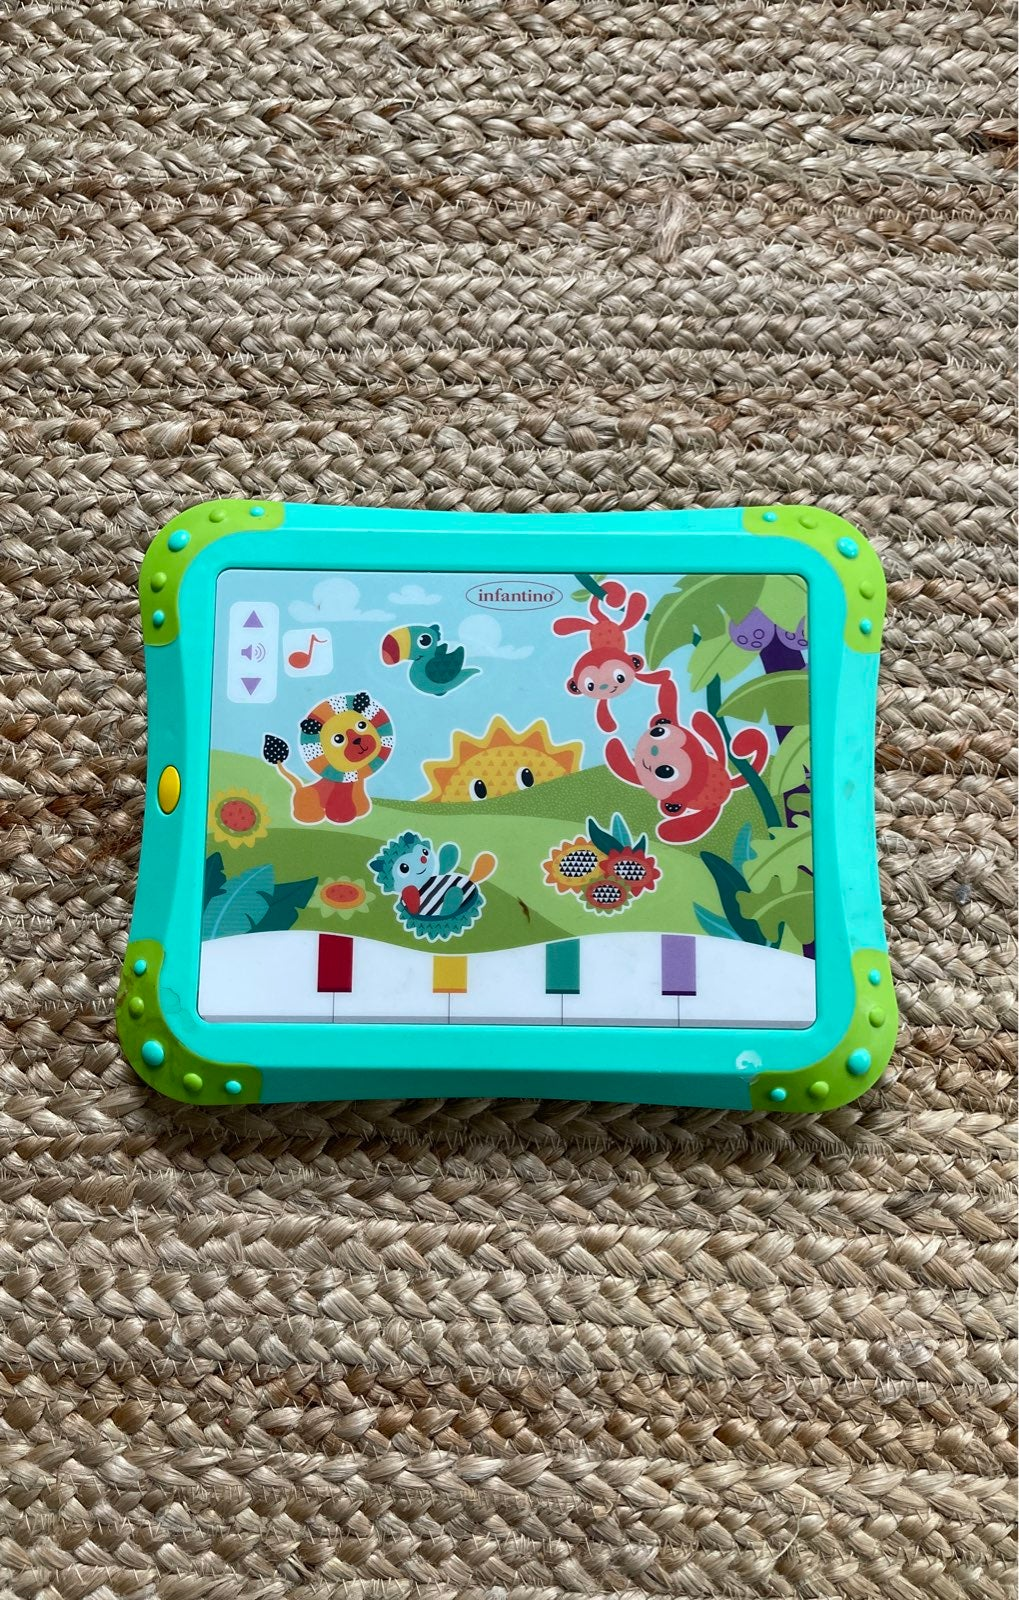 Infantino toy musical ipad